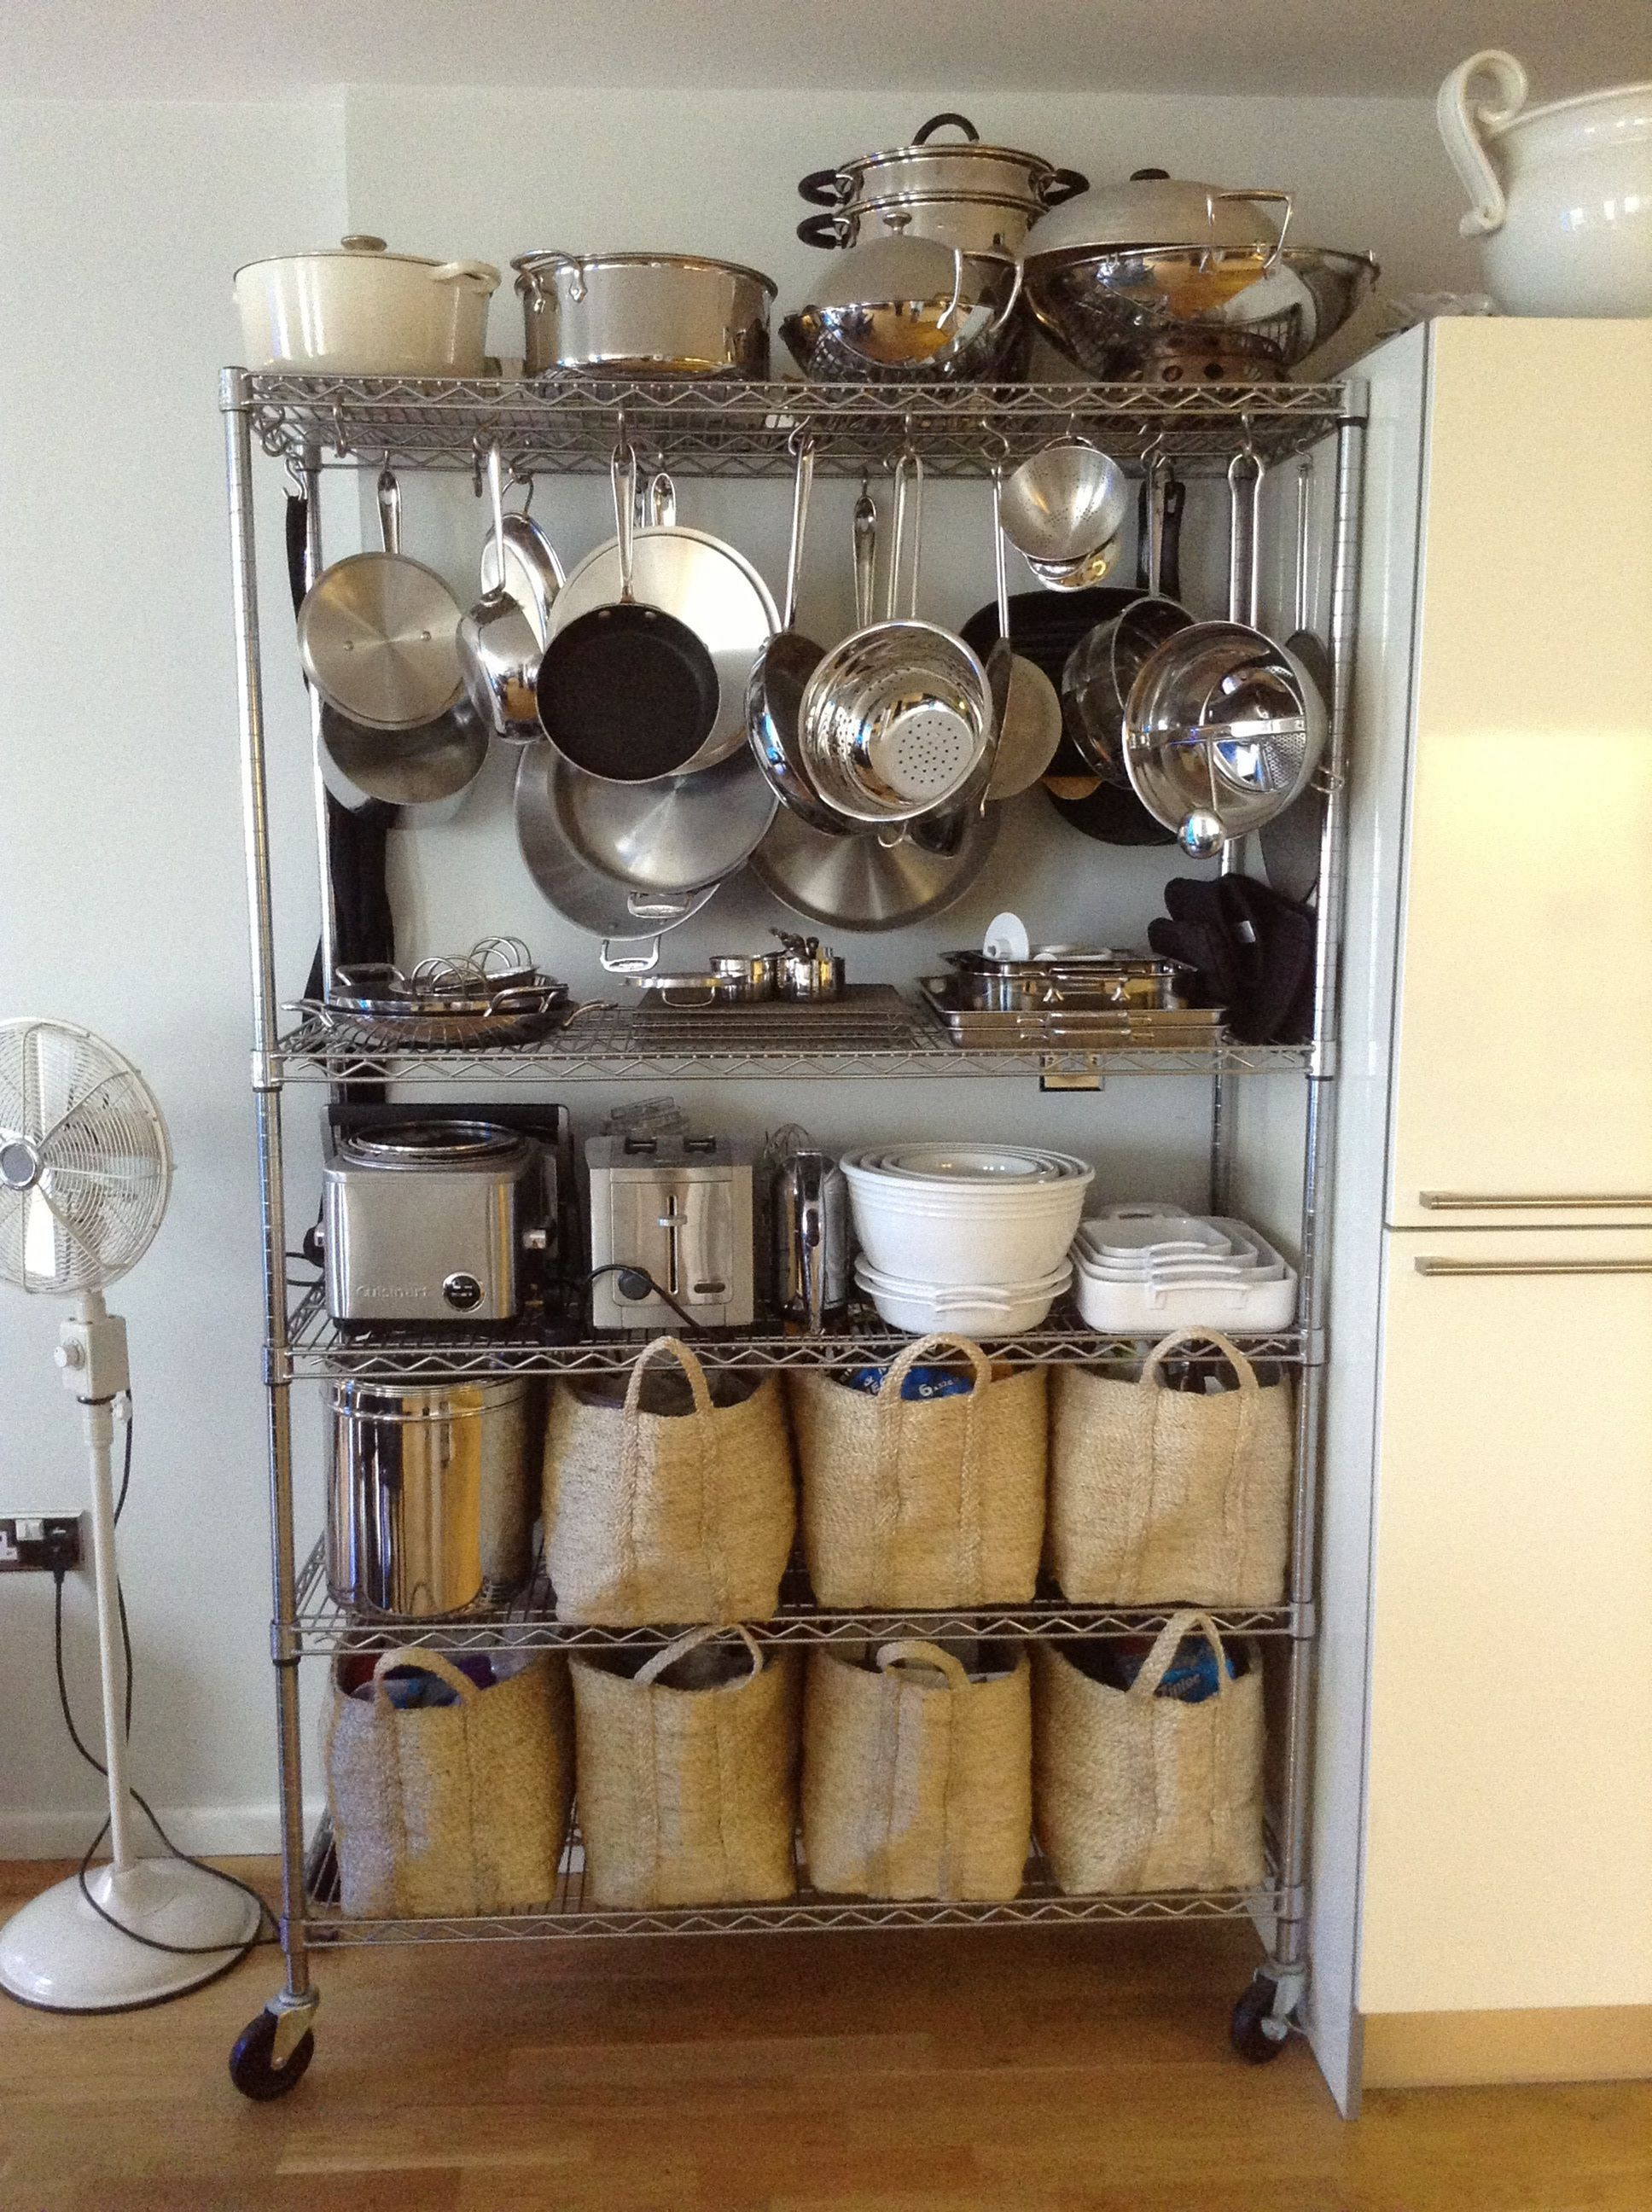 25 Smart Storage Rack Design Ideas For Maintaining House Neatness Small Kitchen Storage Design Your Kitchen Kitchen Storage Rack Small kitchen storage racks